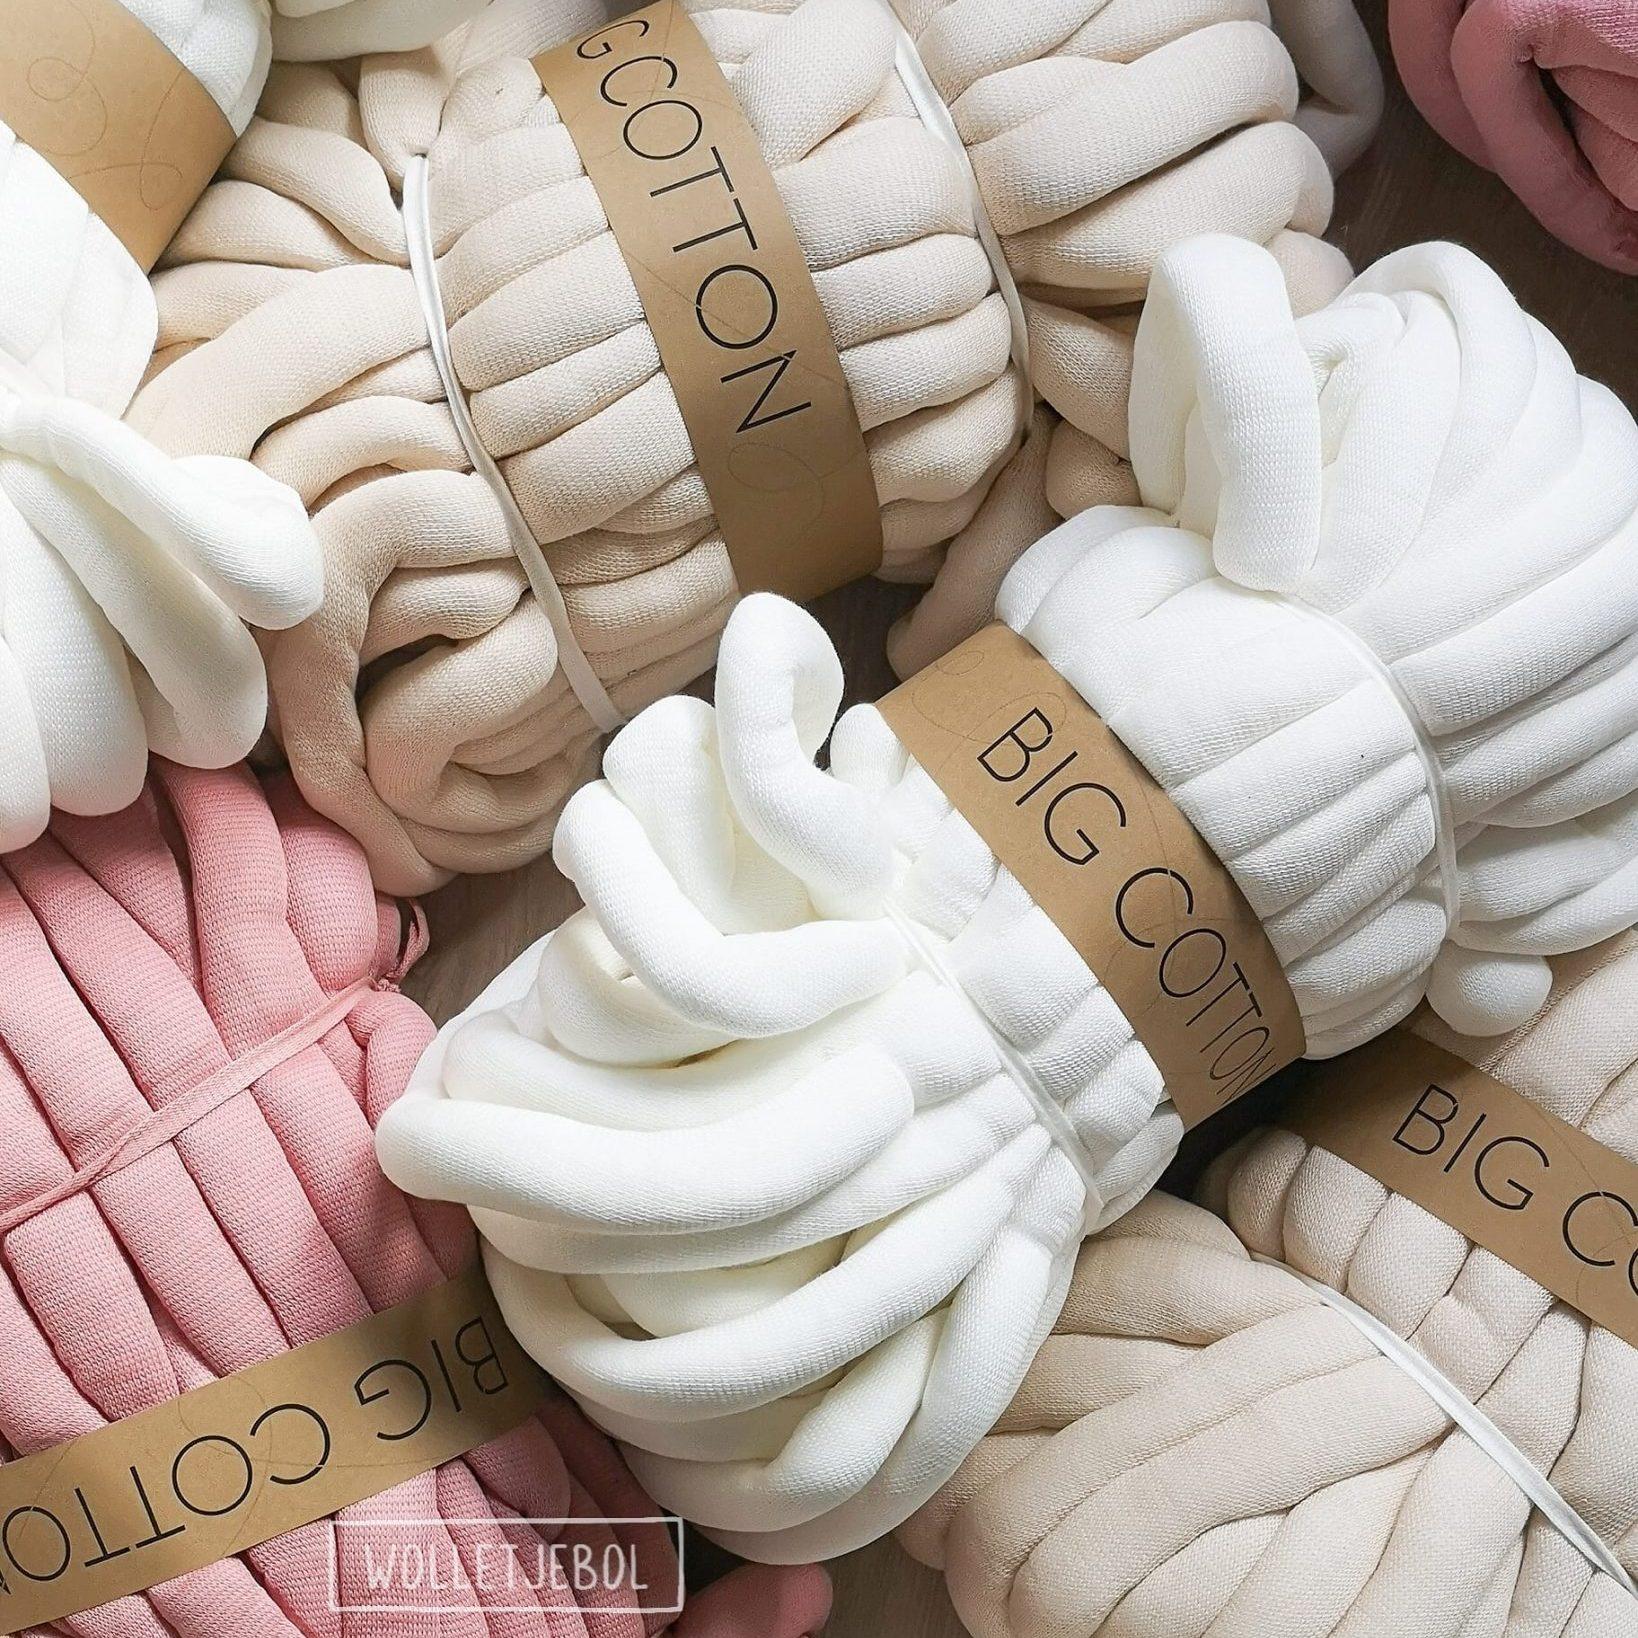 Cream white Sand Old pink DIY chunky organic cotton soft dusty xxl knit crochet plaid bolletje wol bolletje wolletje big cotton vegan childfriendly animalfriendly wolletjebol gots do it yourself diy buy merino wool